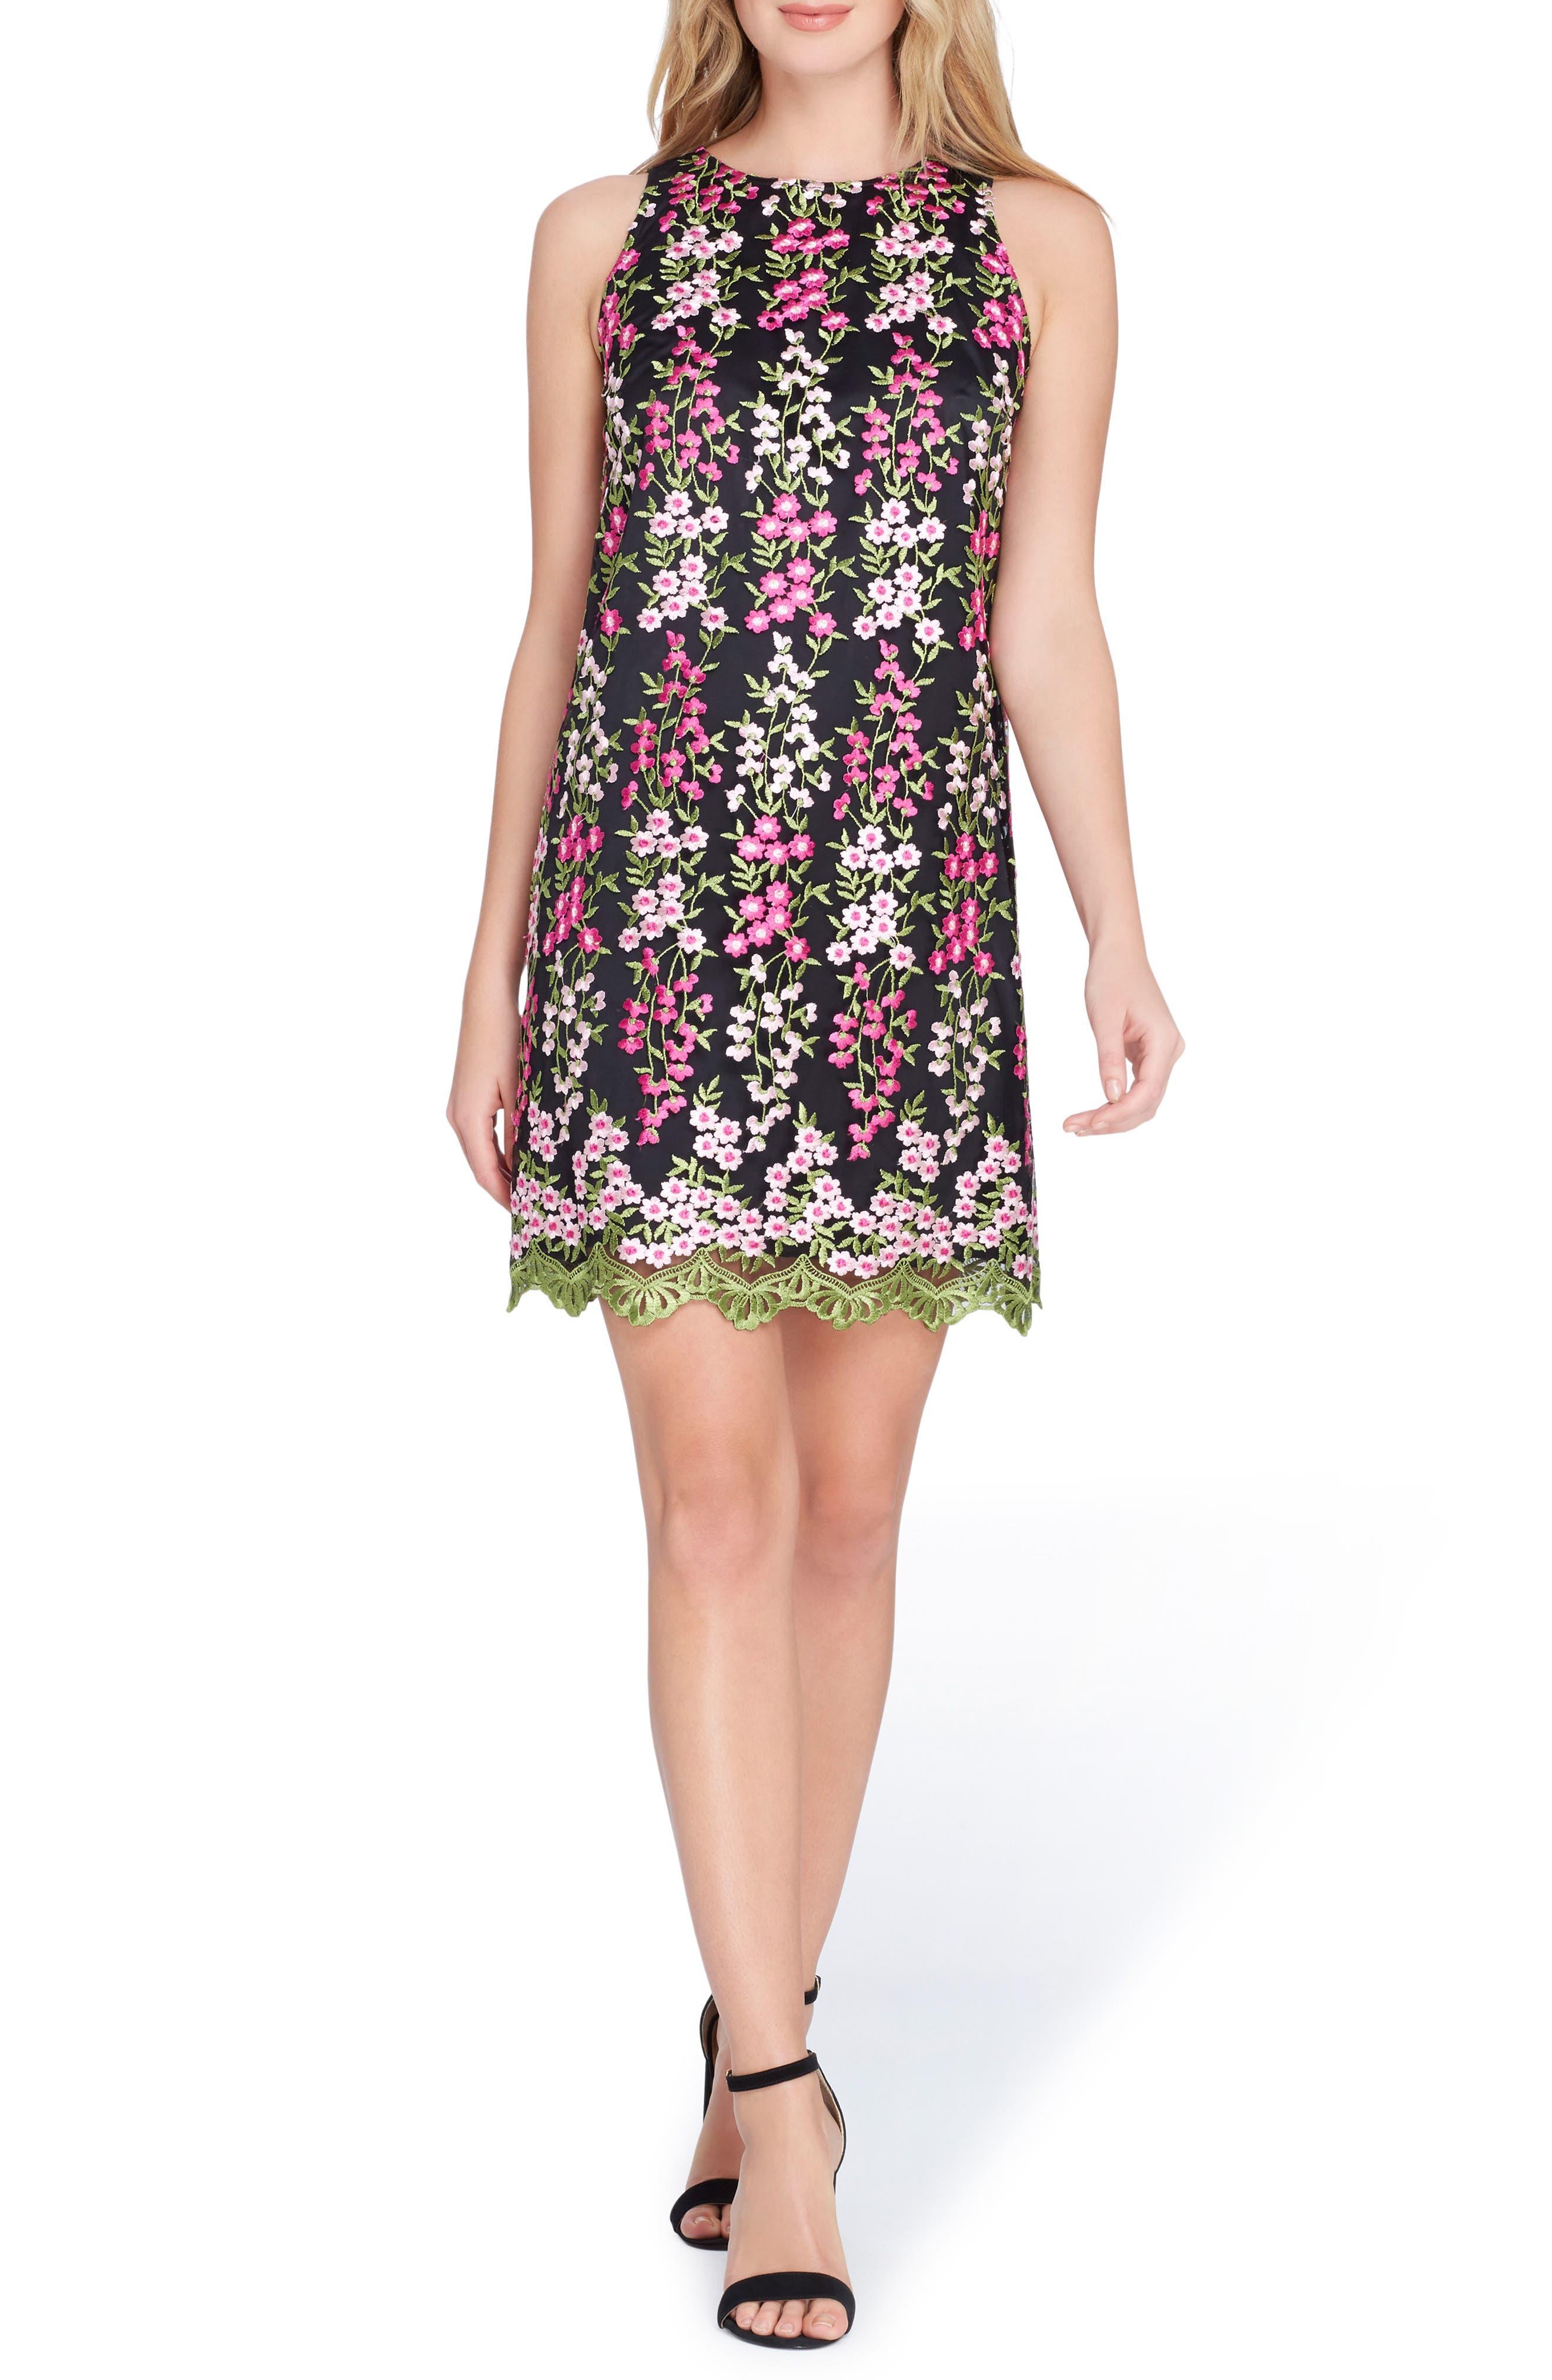 Embroidered Floral Shift Dress,                             Main thumbnail 1, color,                             Black/ Magenta/ Blush